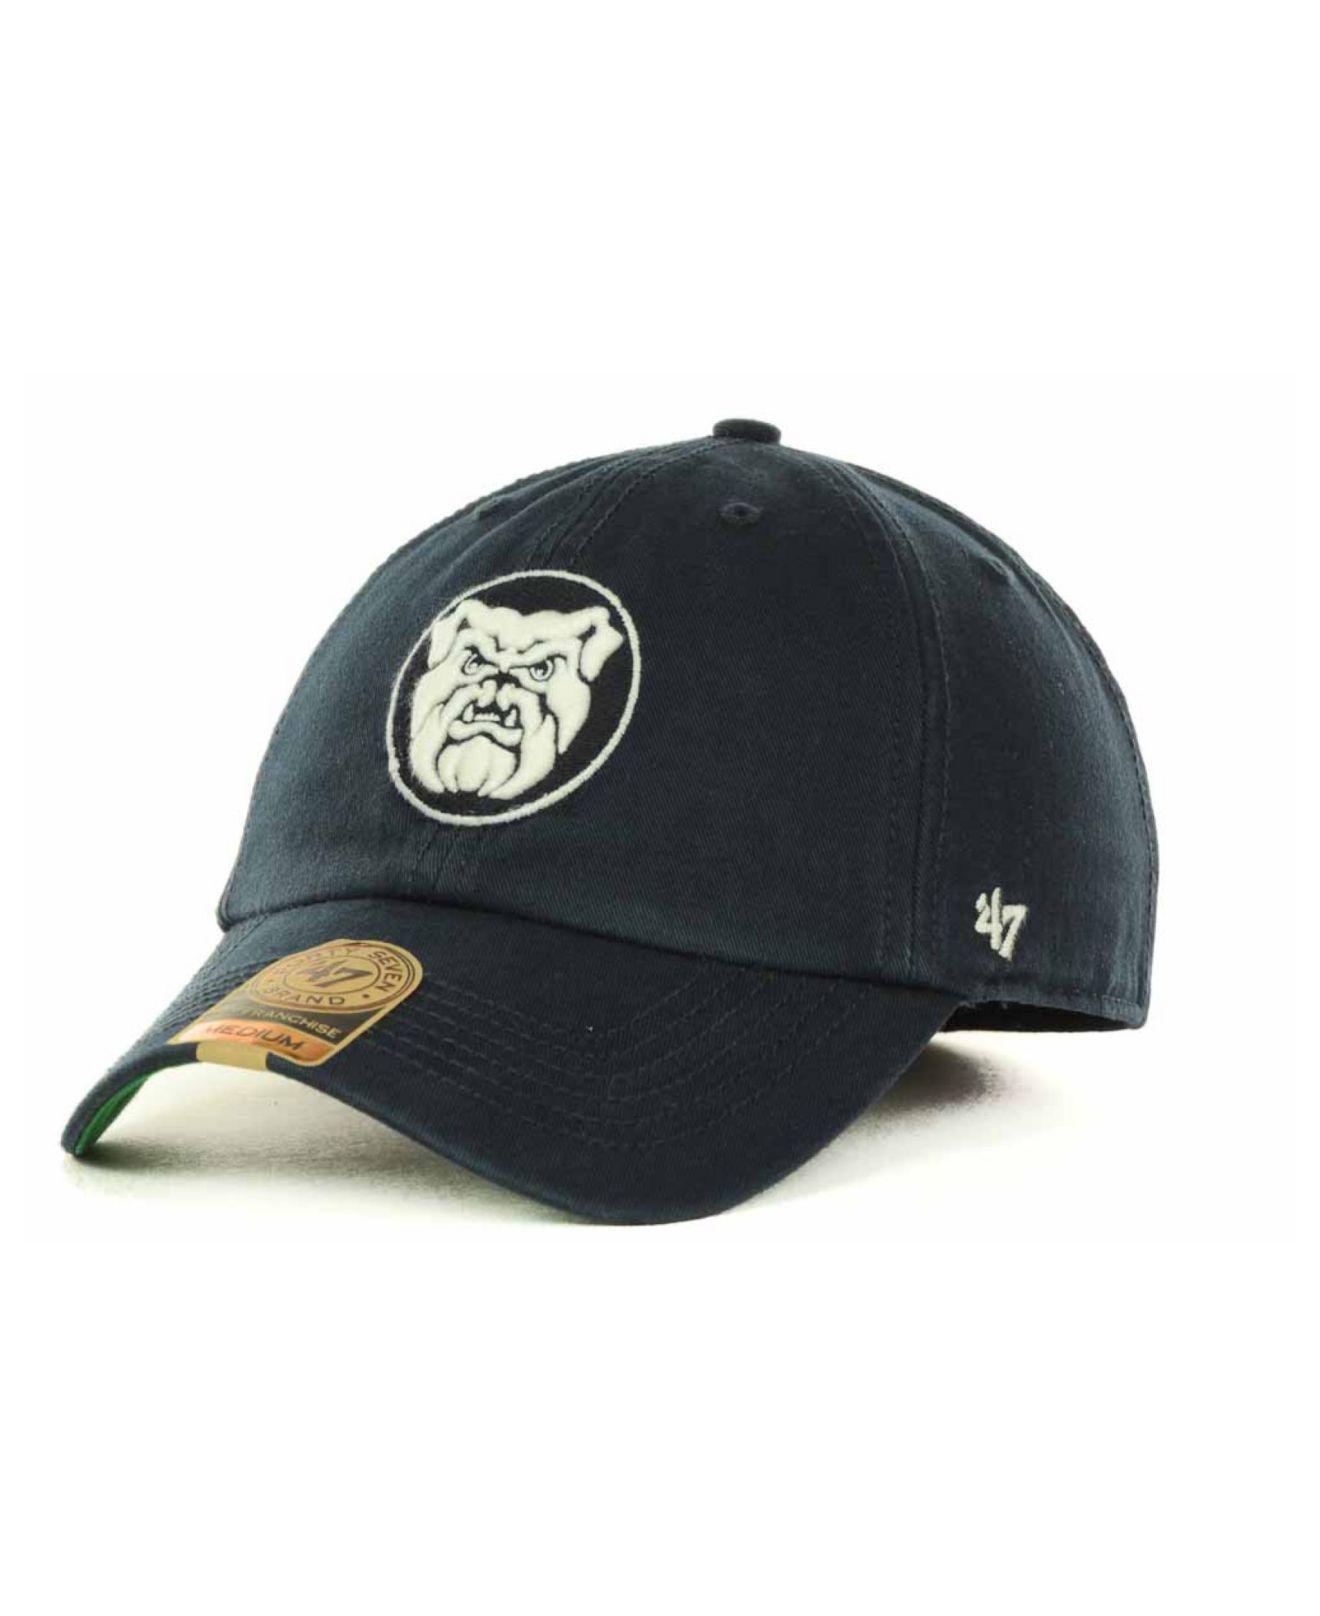 9df40a8f6e1 Lyst - 47 Brand Butler Bulldogs Franchise Cap in Blue for Men